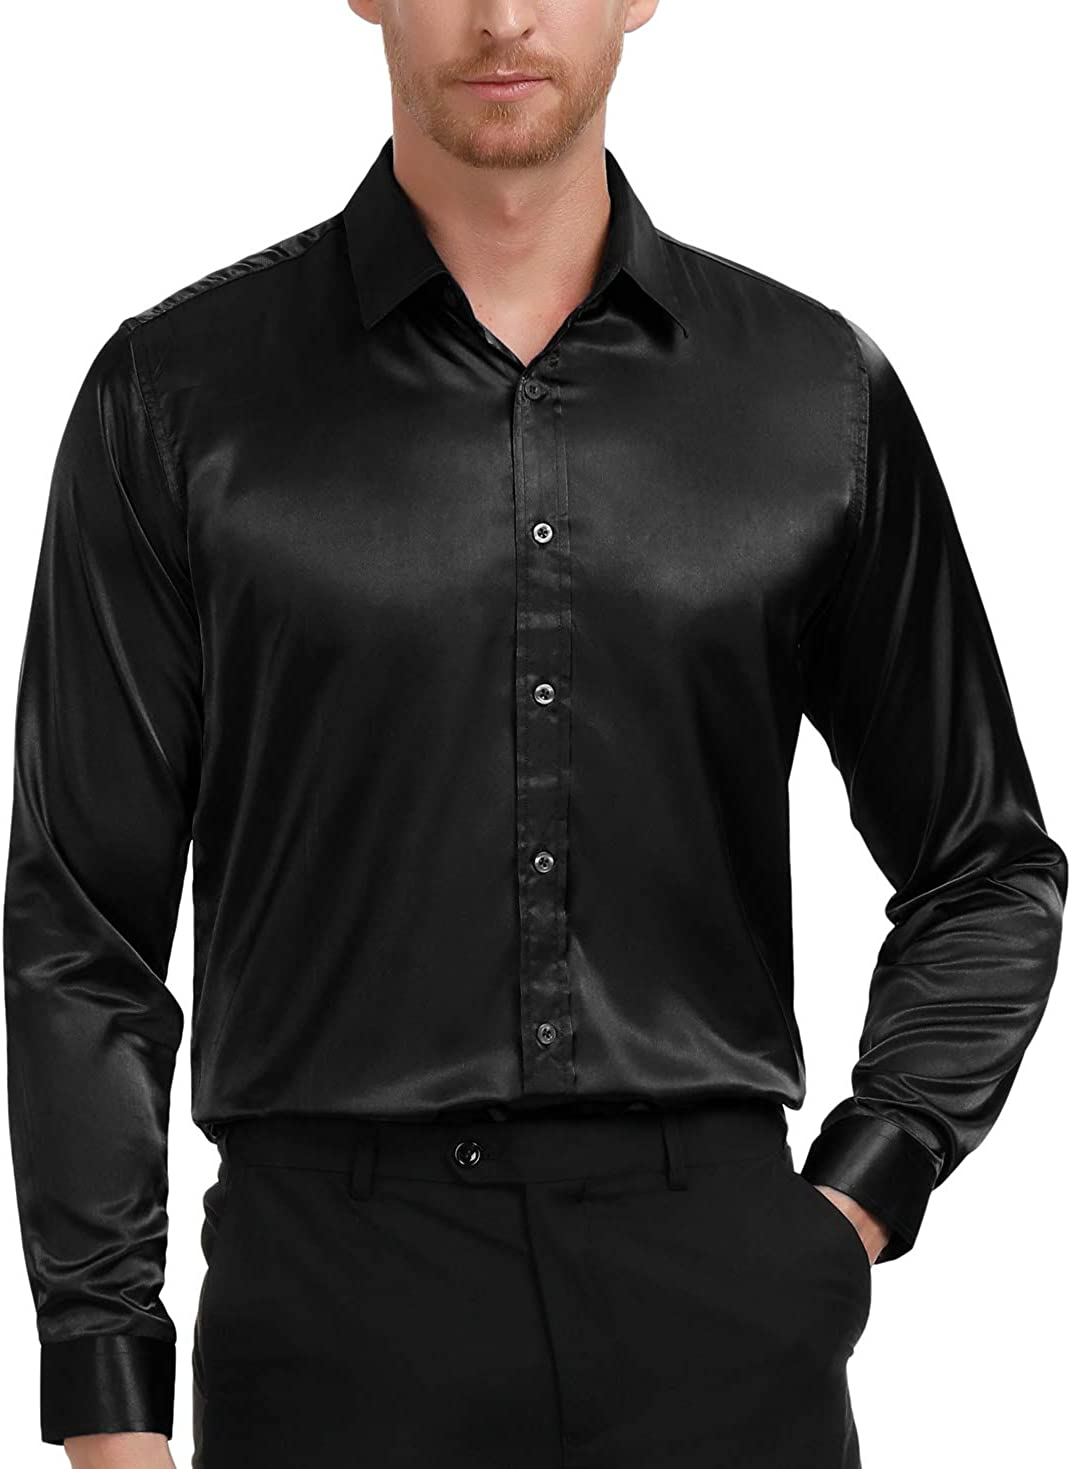 Paul Jones Men's Fashion Slik Like Luxury Party Shirt Basic Designed